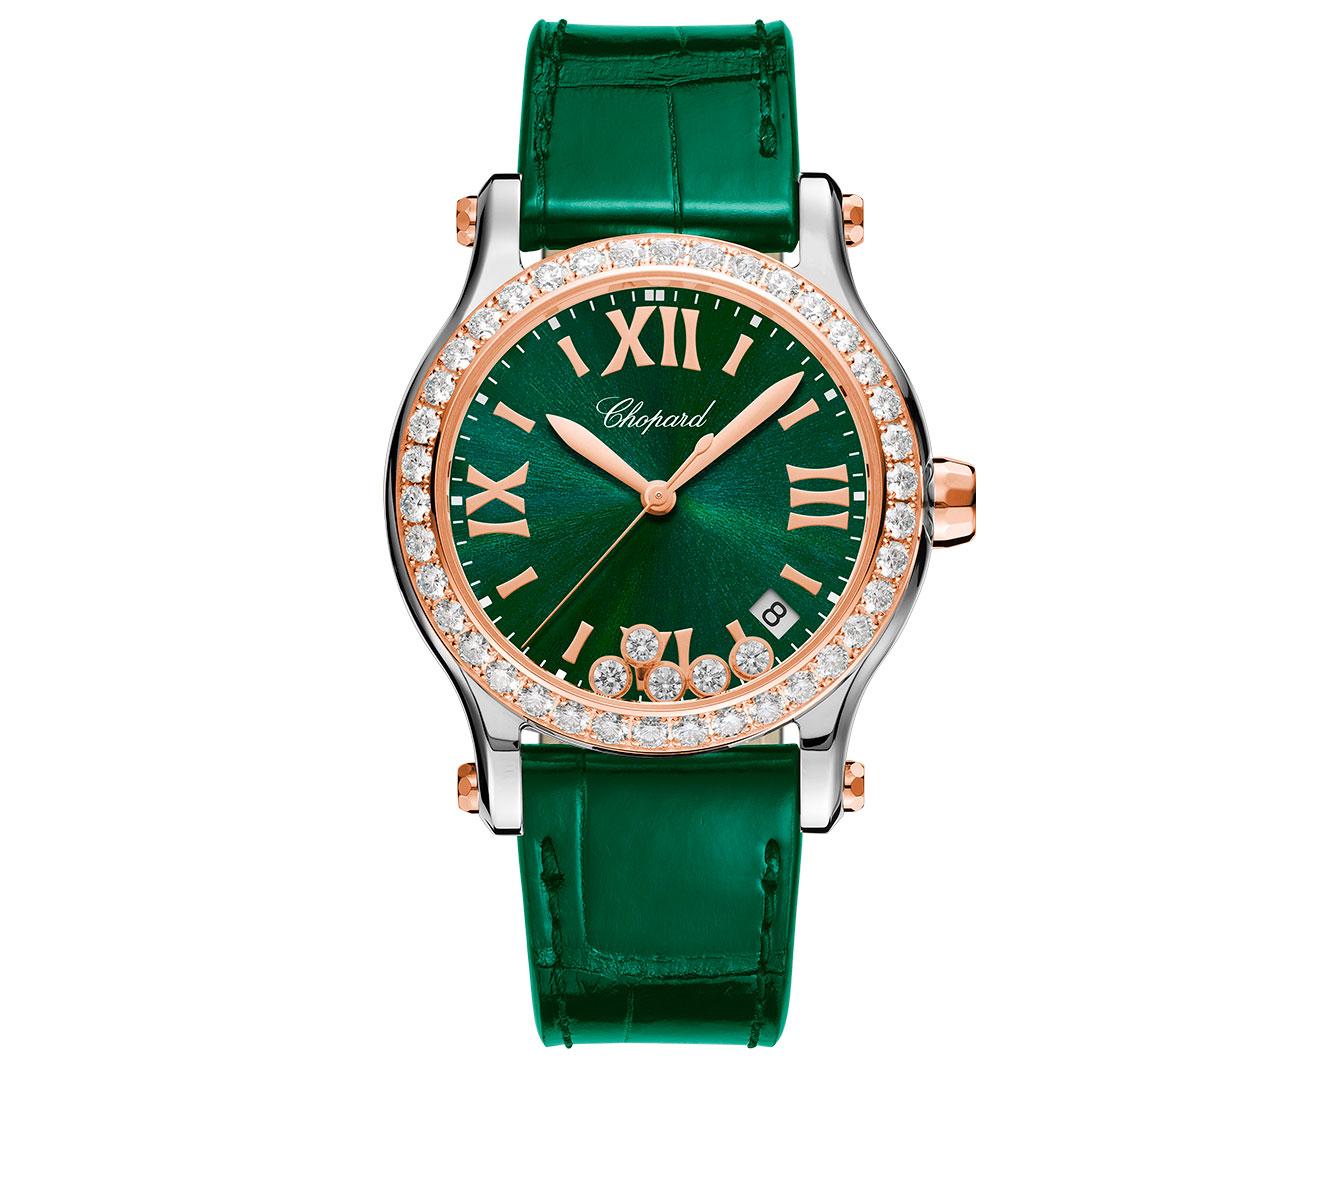 Скупка часов Chopard, займ под залог часов